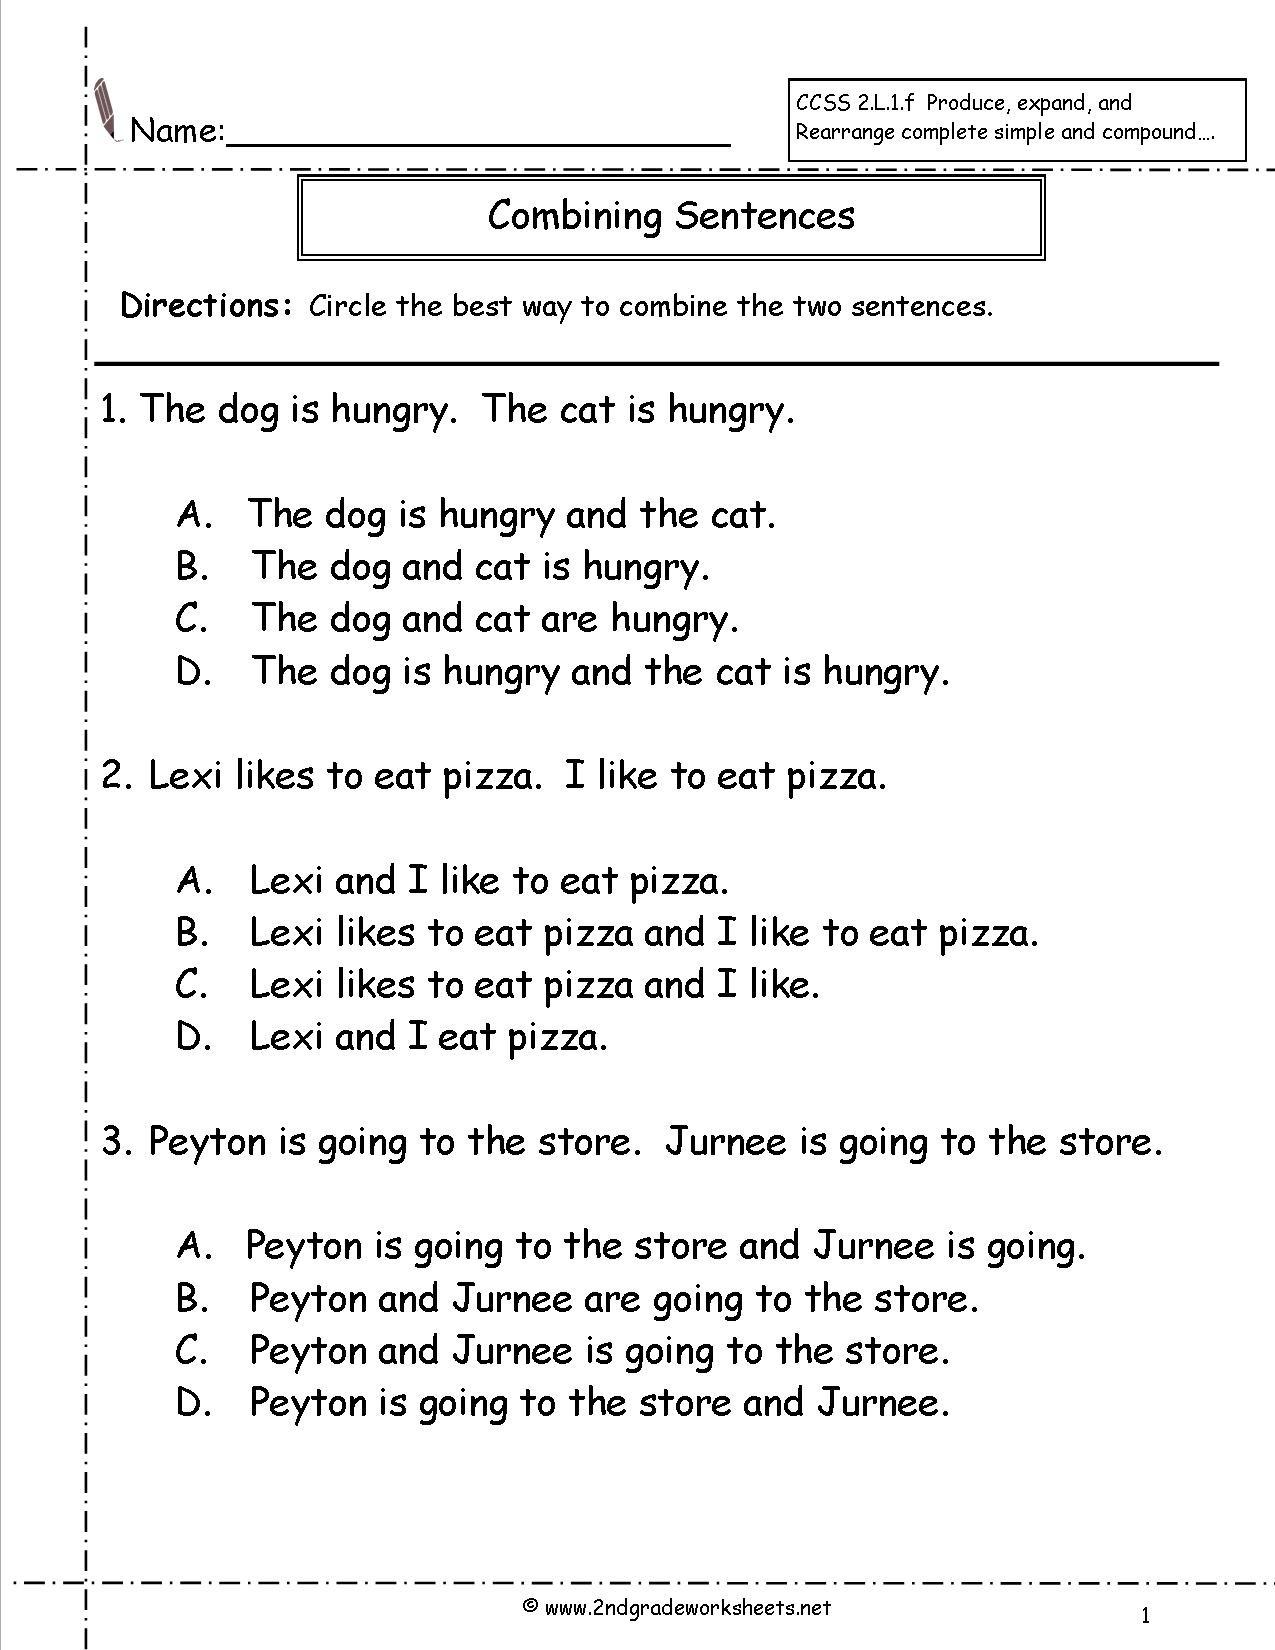 Topic Sentences Worksheets 3rd Grade Second Grade Sentences Worksheets Ccss 2 L 1 F Worksheets